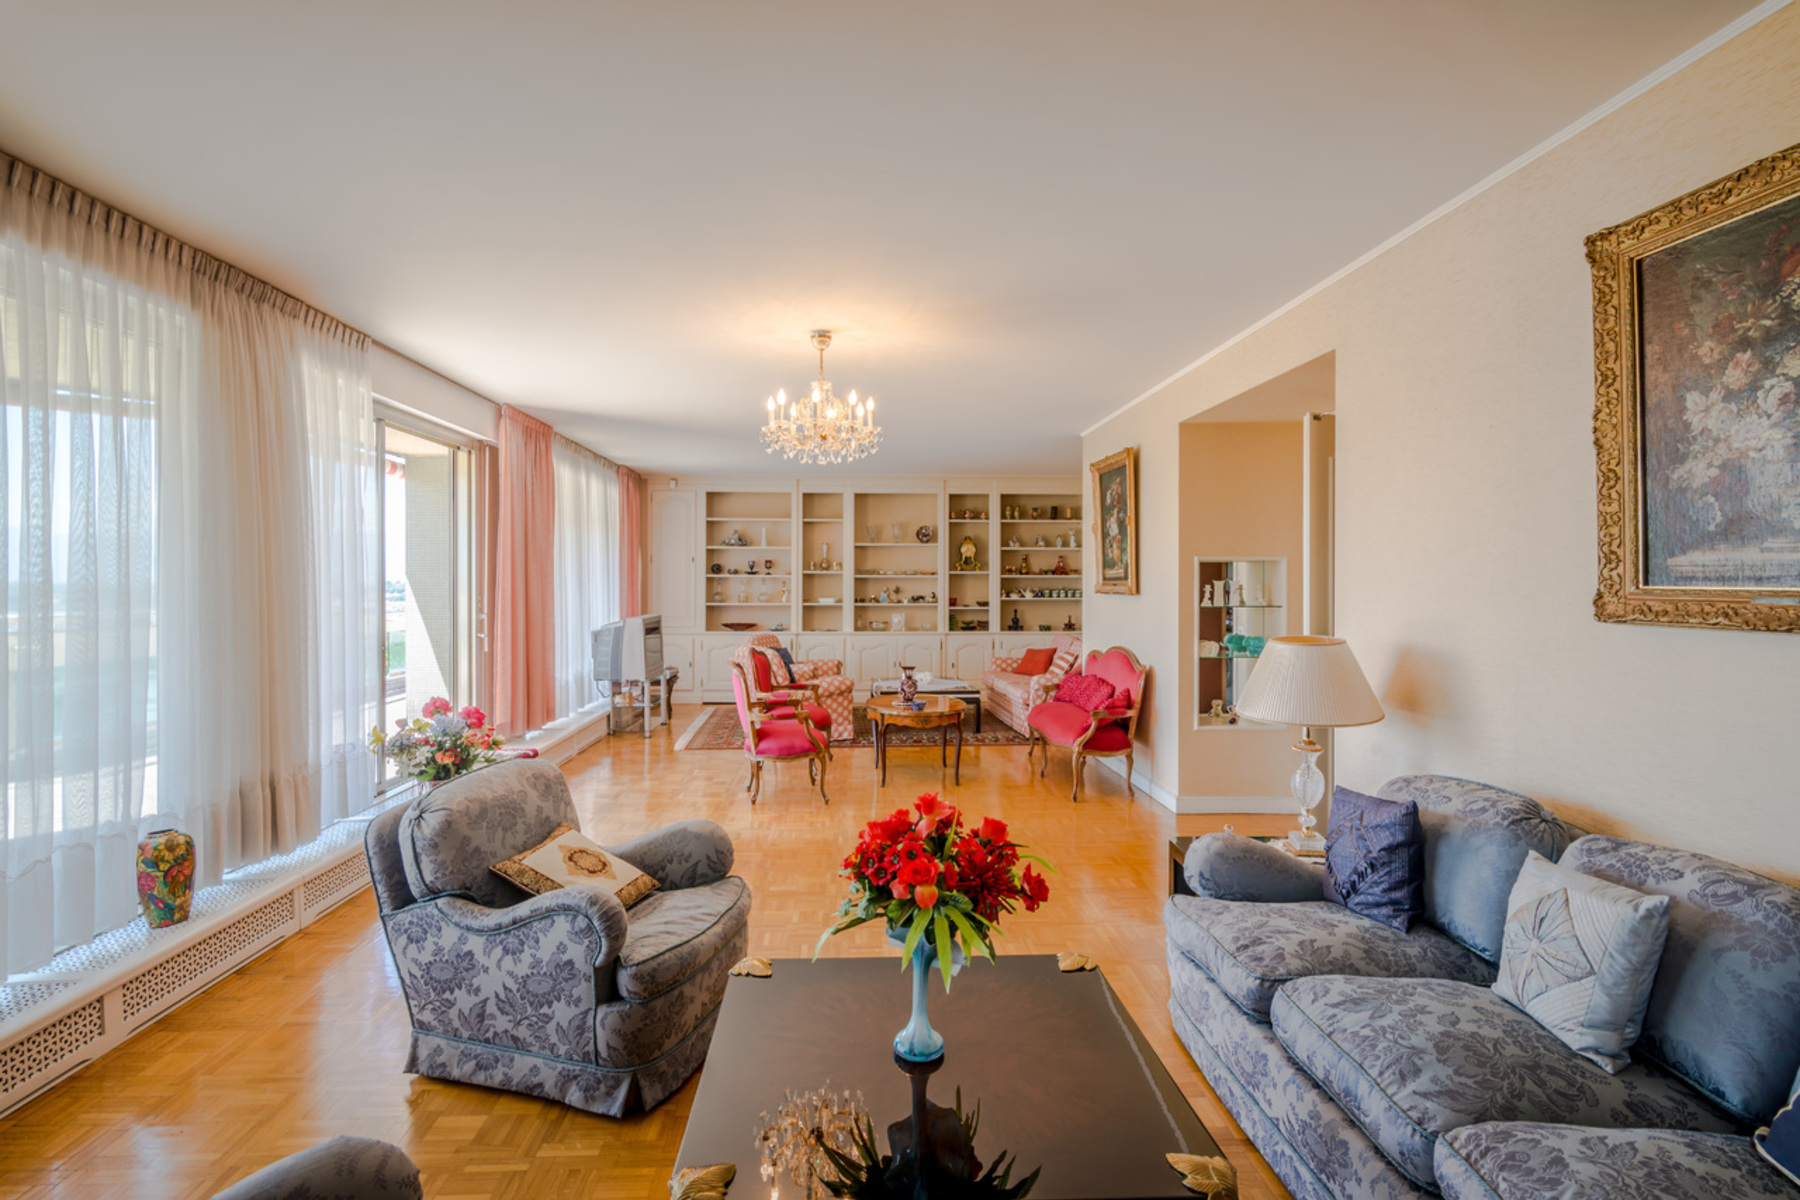 Apartamento para Venda às Loft apartment with unobstructed views over Champel Geneva, Genebra, 1206 Suíça